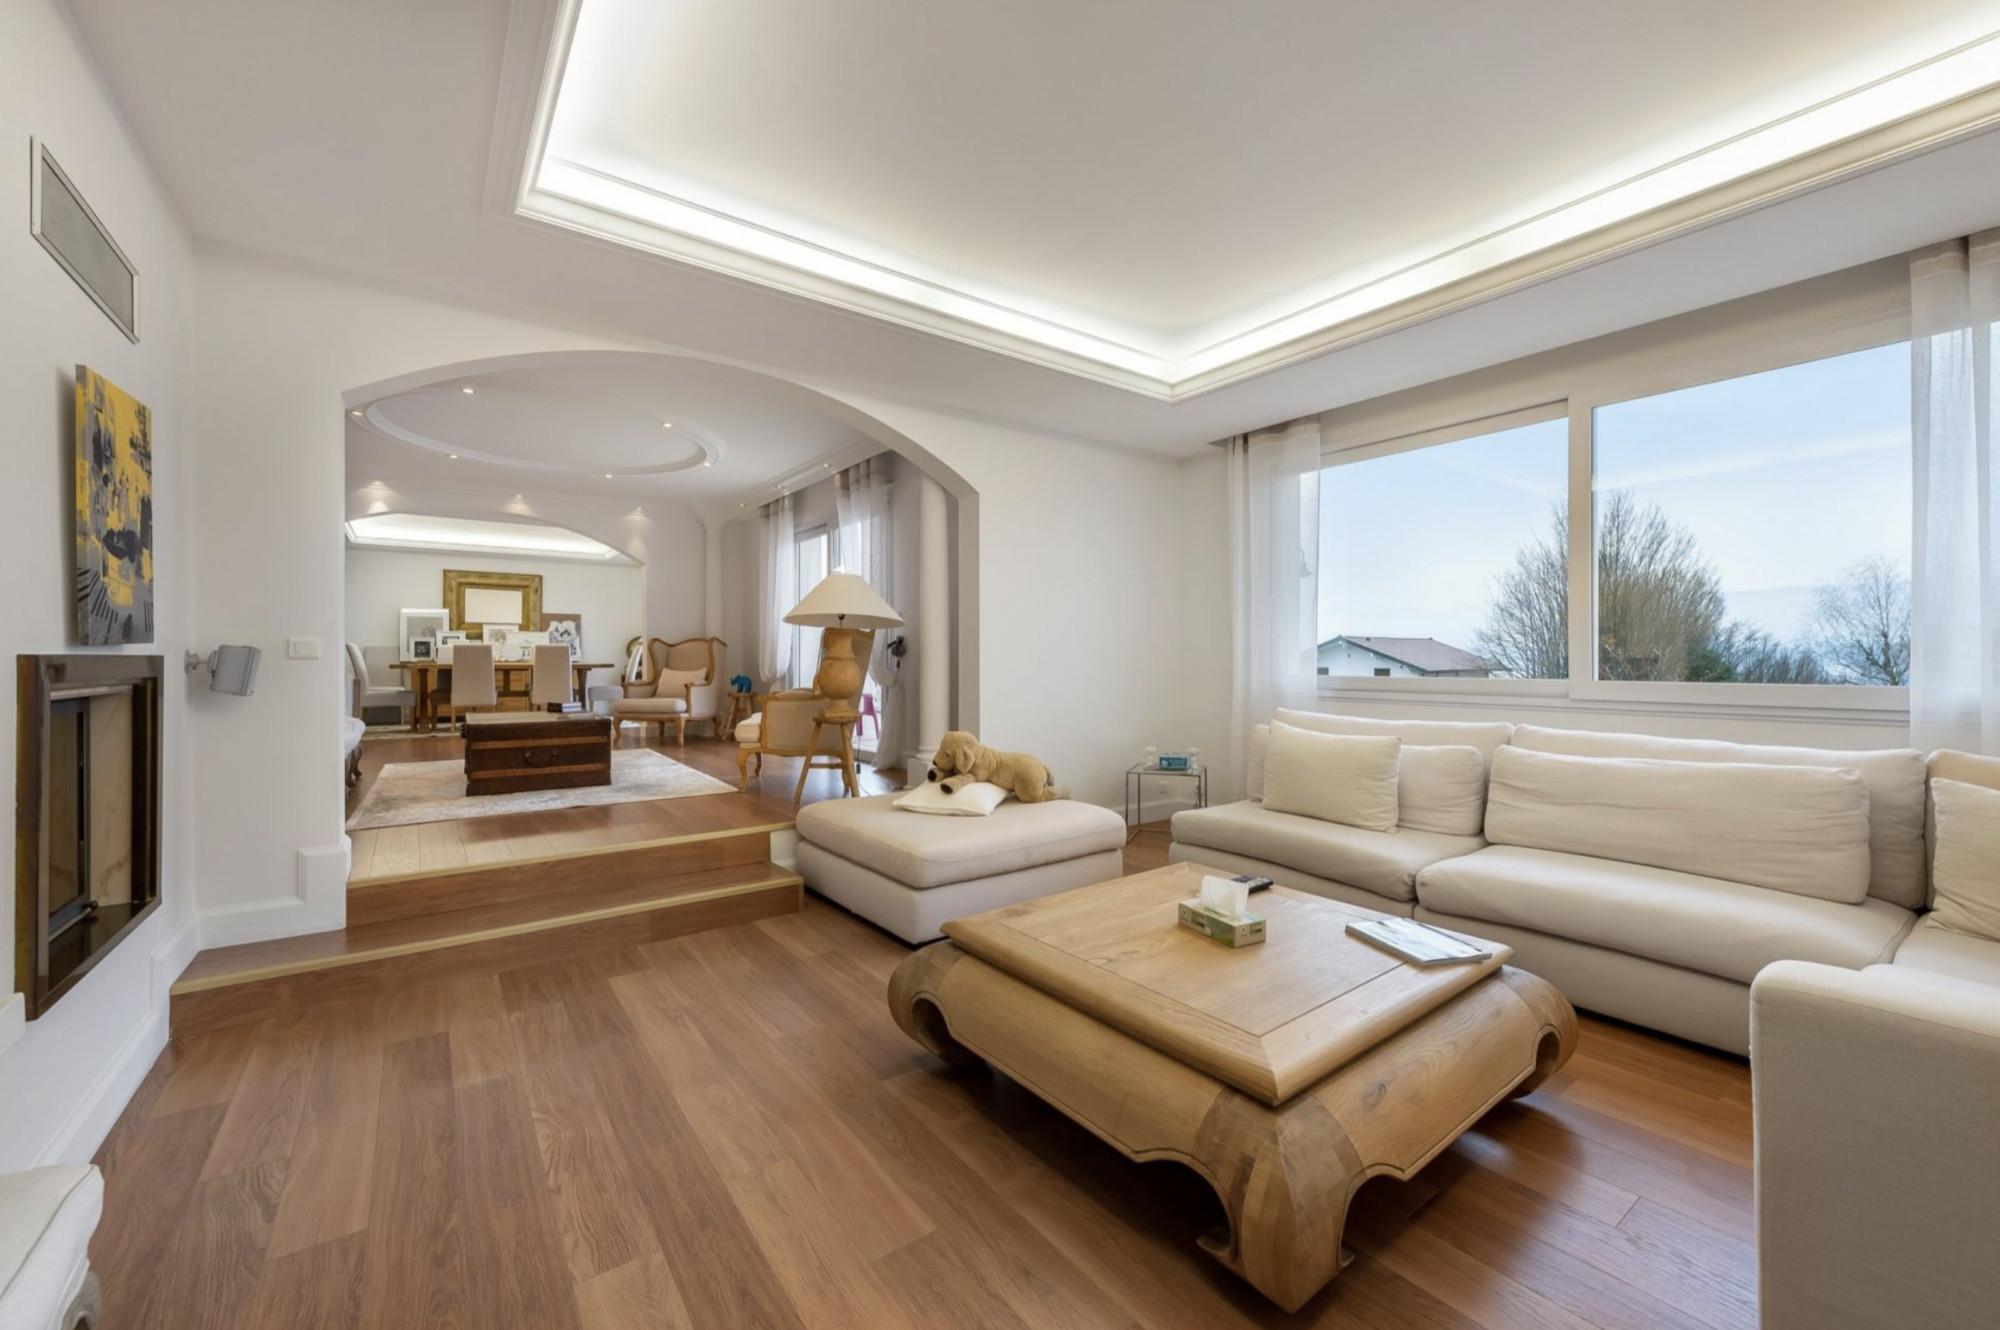 Real Estate with Lake View in Chens sur Leman Lake Geneva